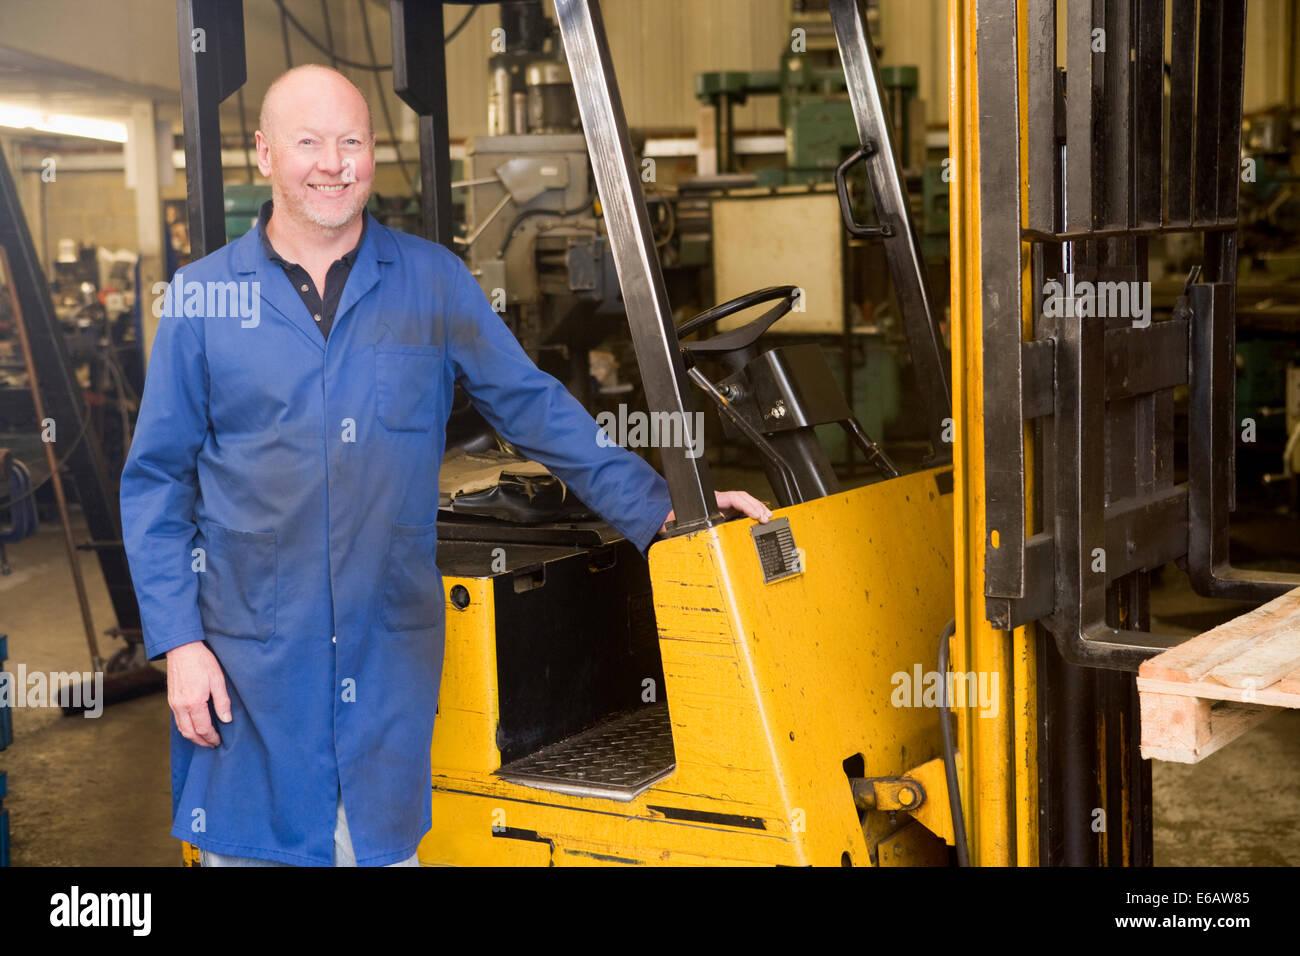 logistics forklift warehouse clerk fork lift driver stock photo logistics forklift warehouse clerk fork lift driver